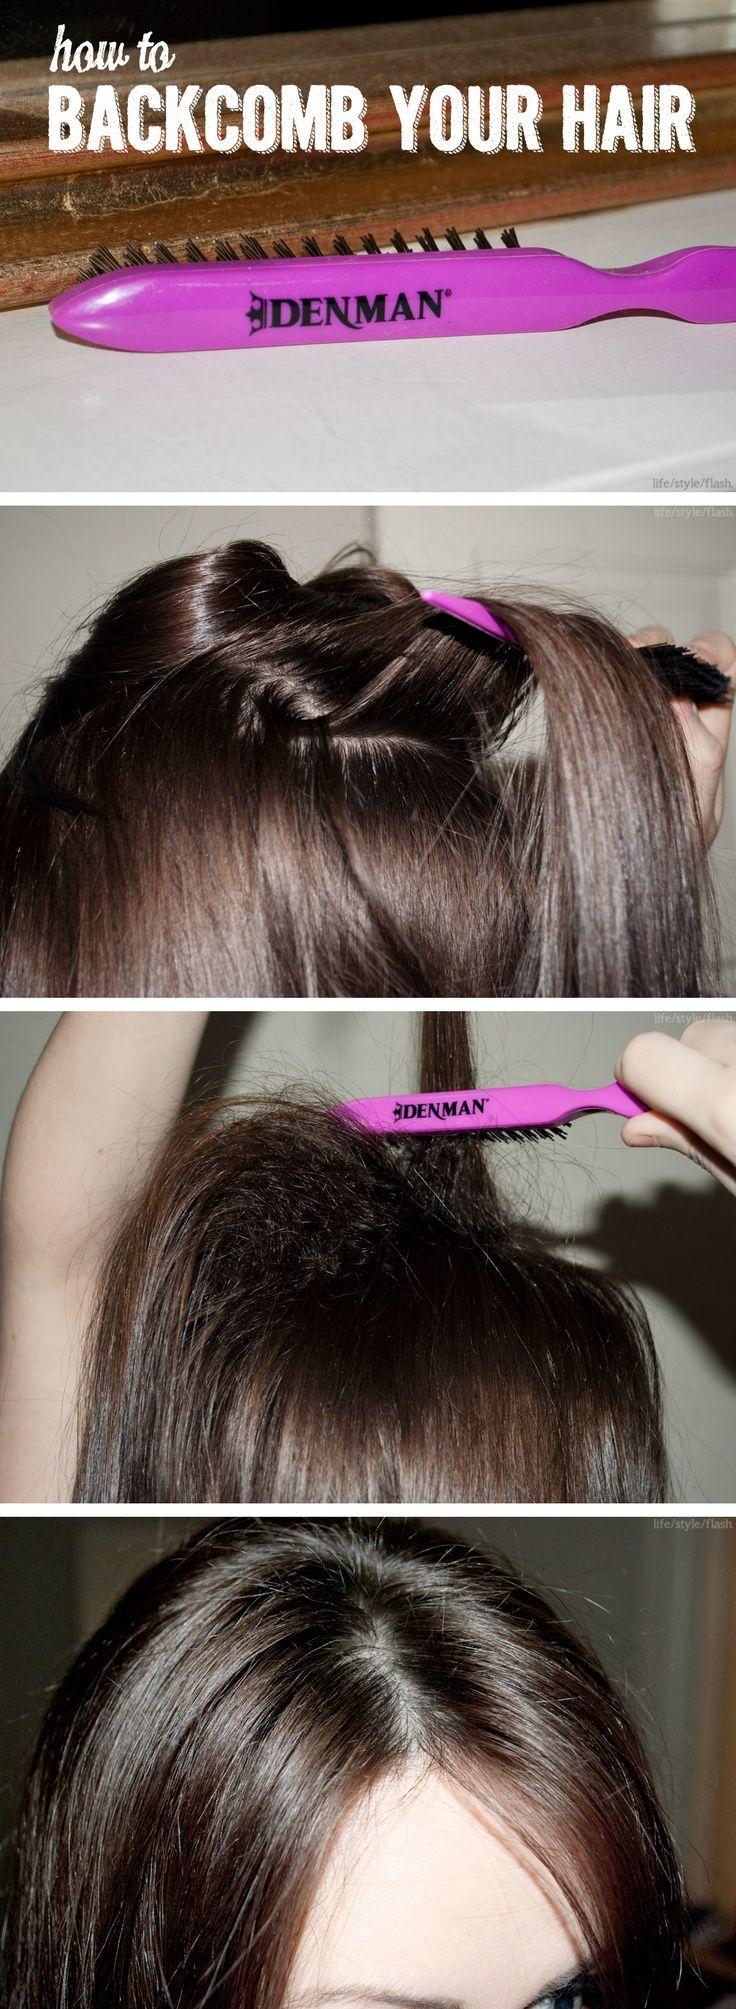 How To Back Comb Hair Comb Hair How To Backcomb Hair Hair Styles Teased Hair Tutorials